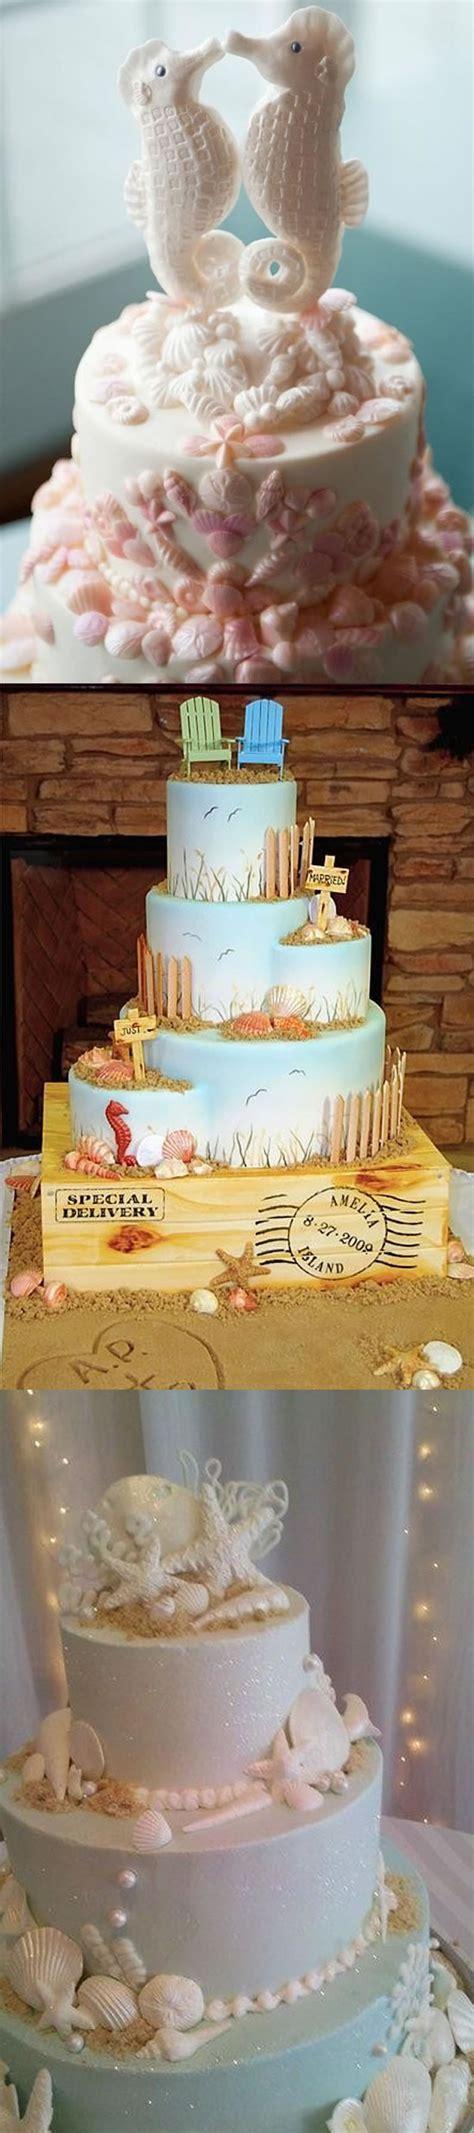 diy wedding cakes for beach theme weddings beach wedding